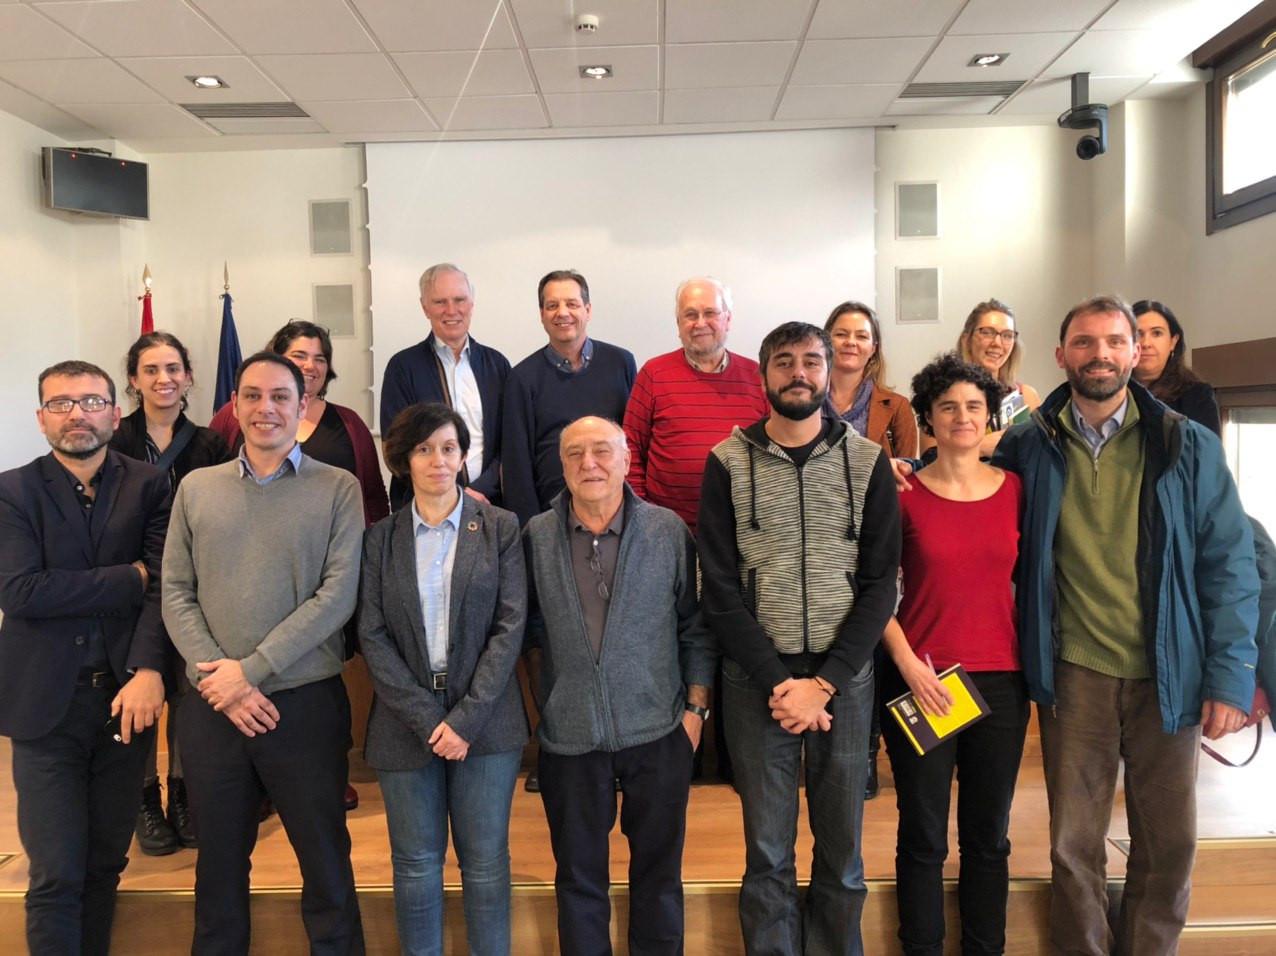 reunion-relator-pobreza-grupo